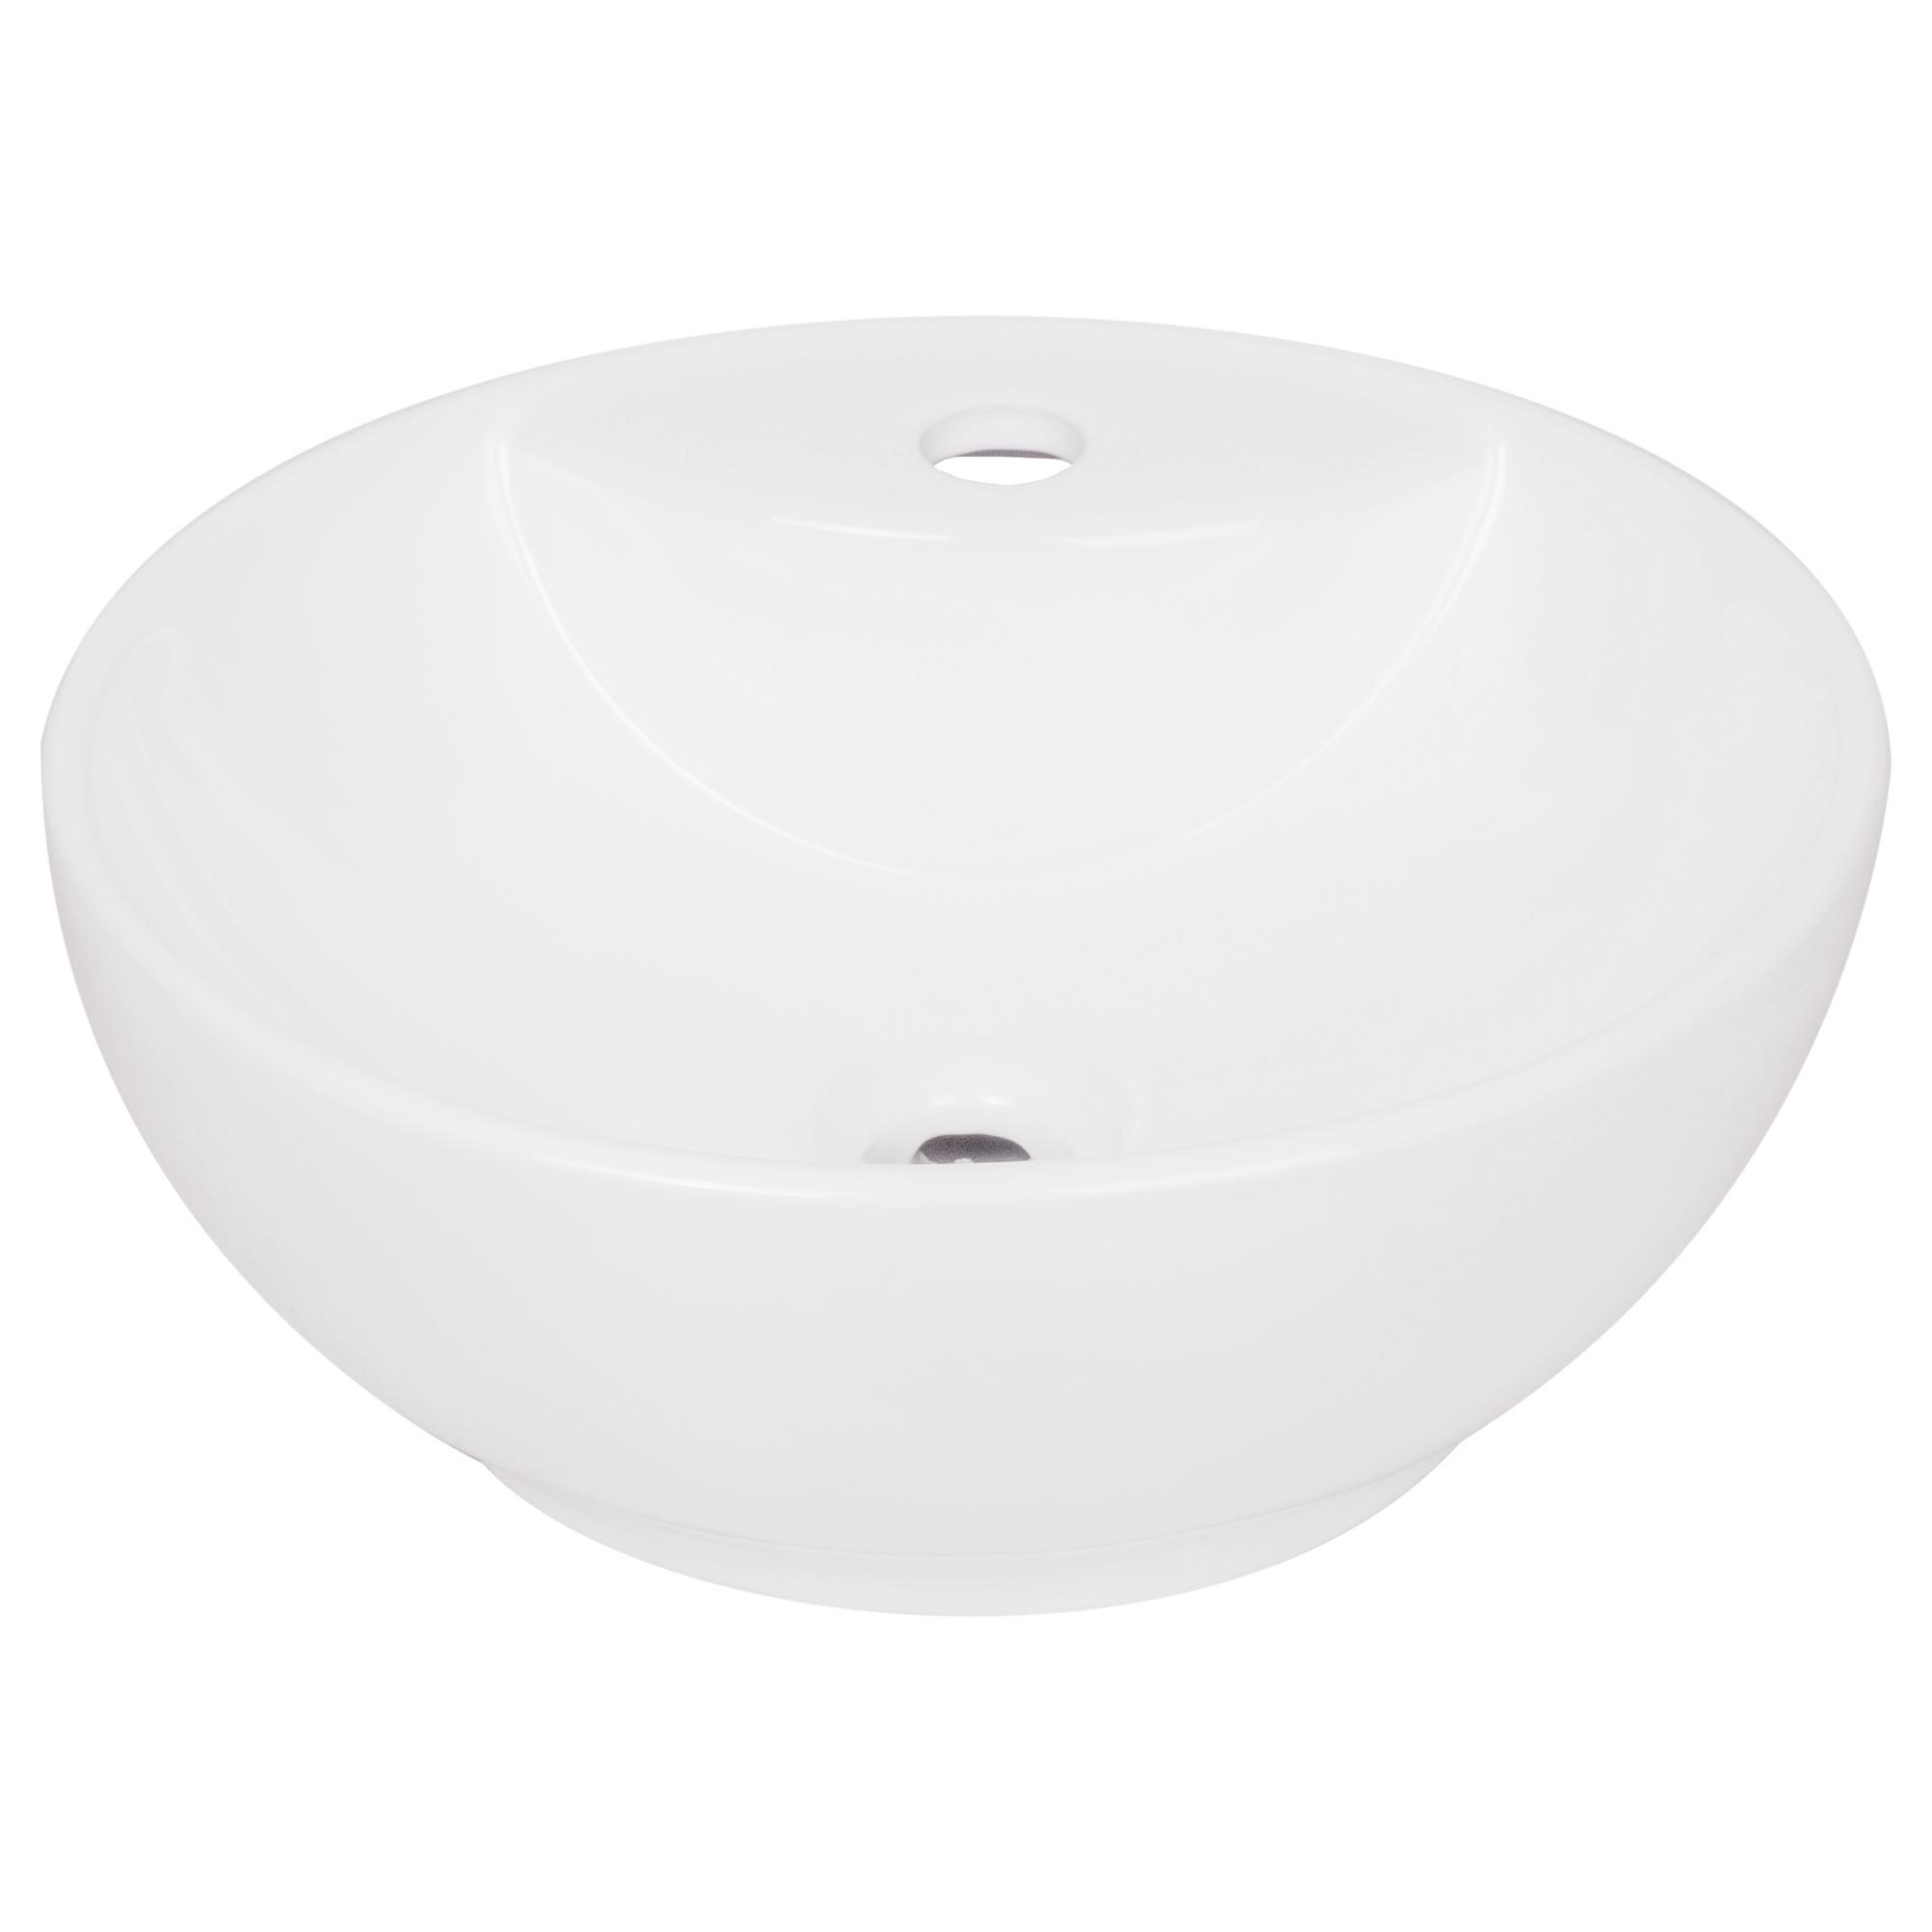 Раковина круглая Нептун, керамика, 40 см, цвет белый